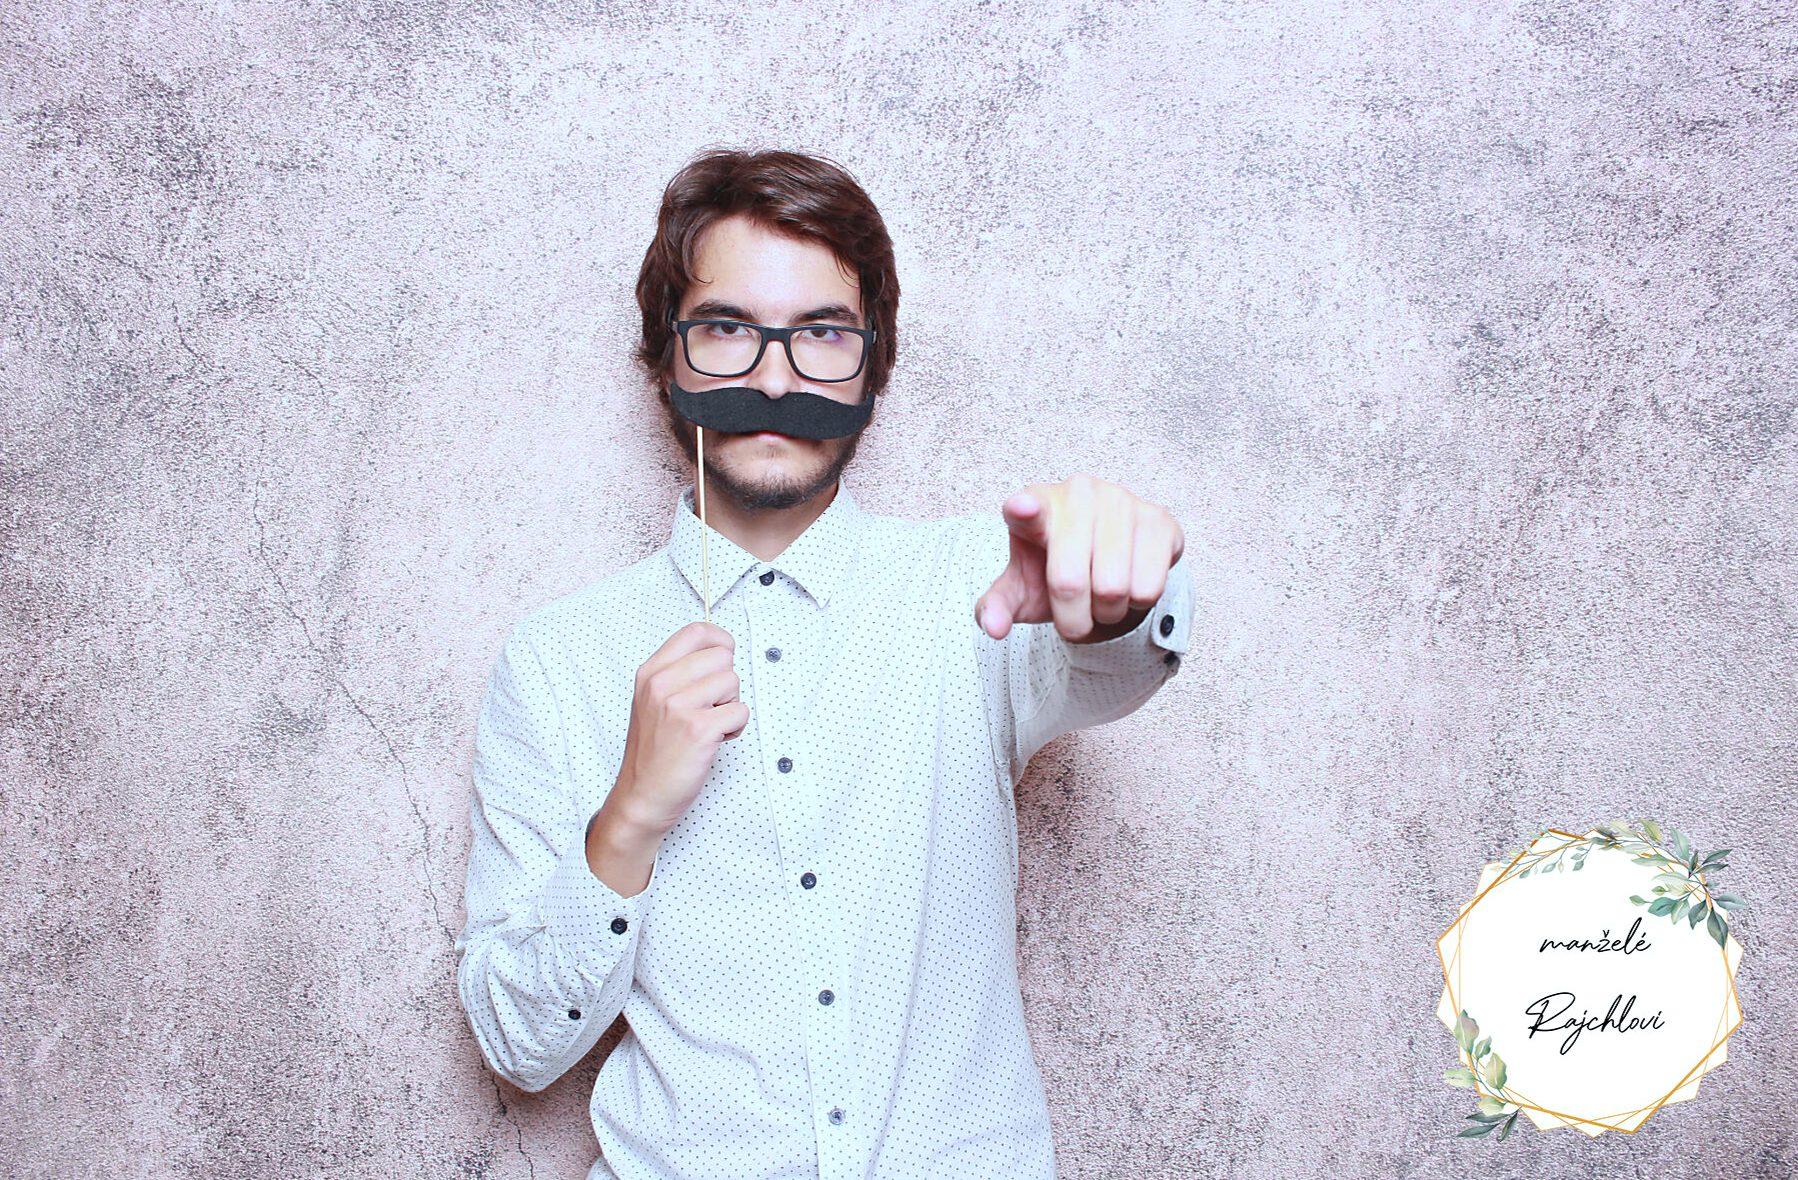 fotokoutek-oslava-praha-svatba-rajchlovi-28-8-2021-743495